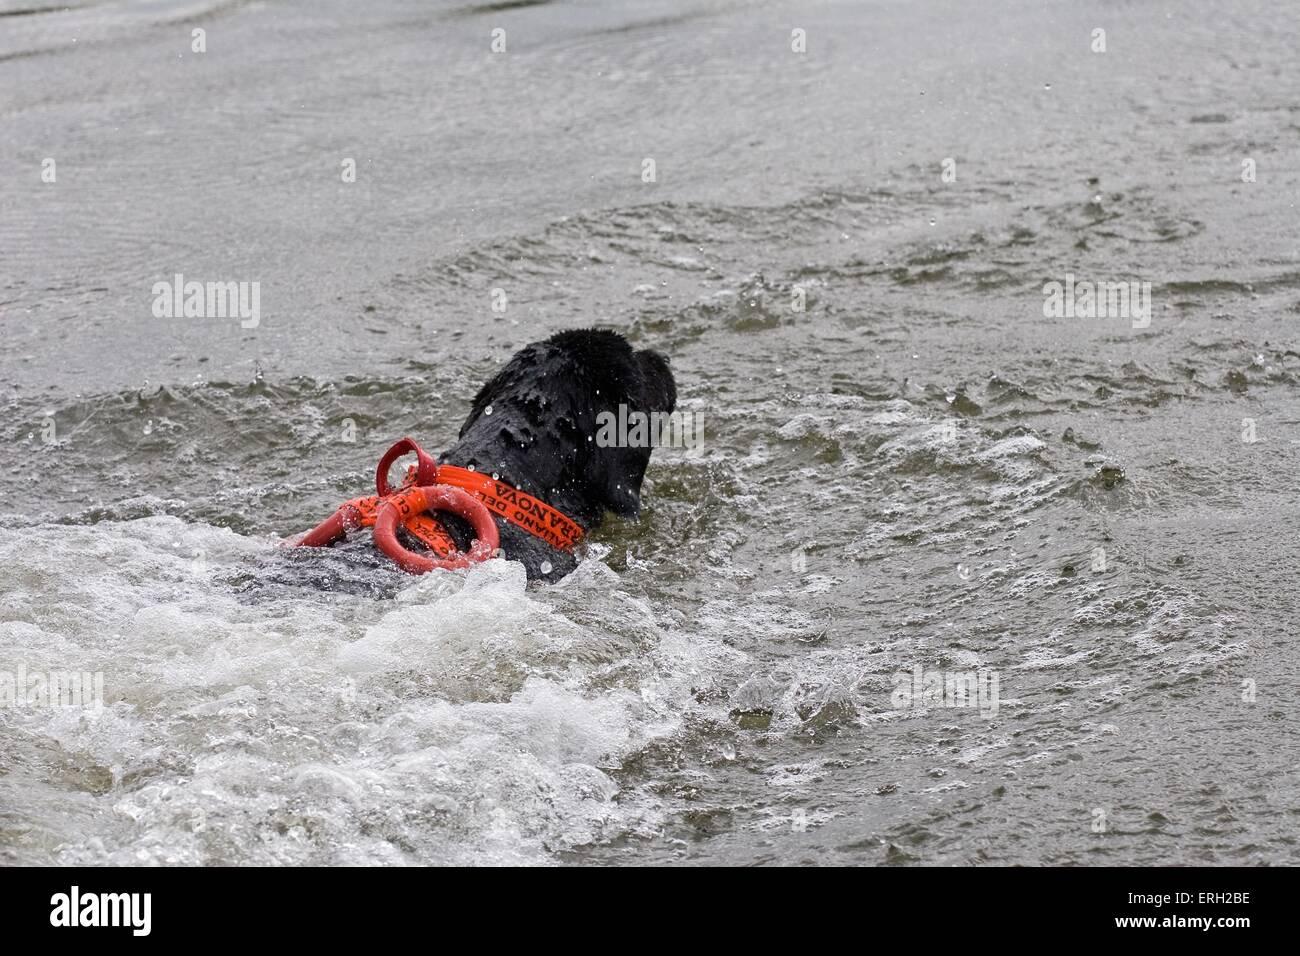 swimming rescue dog - Stock Image